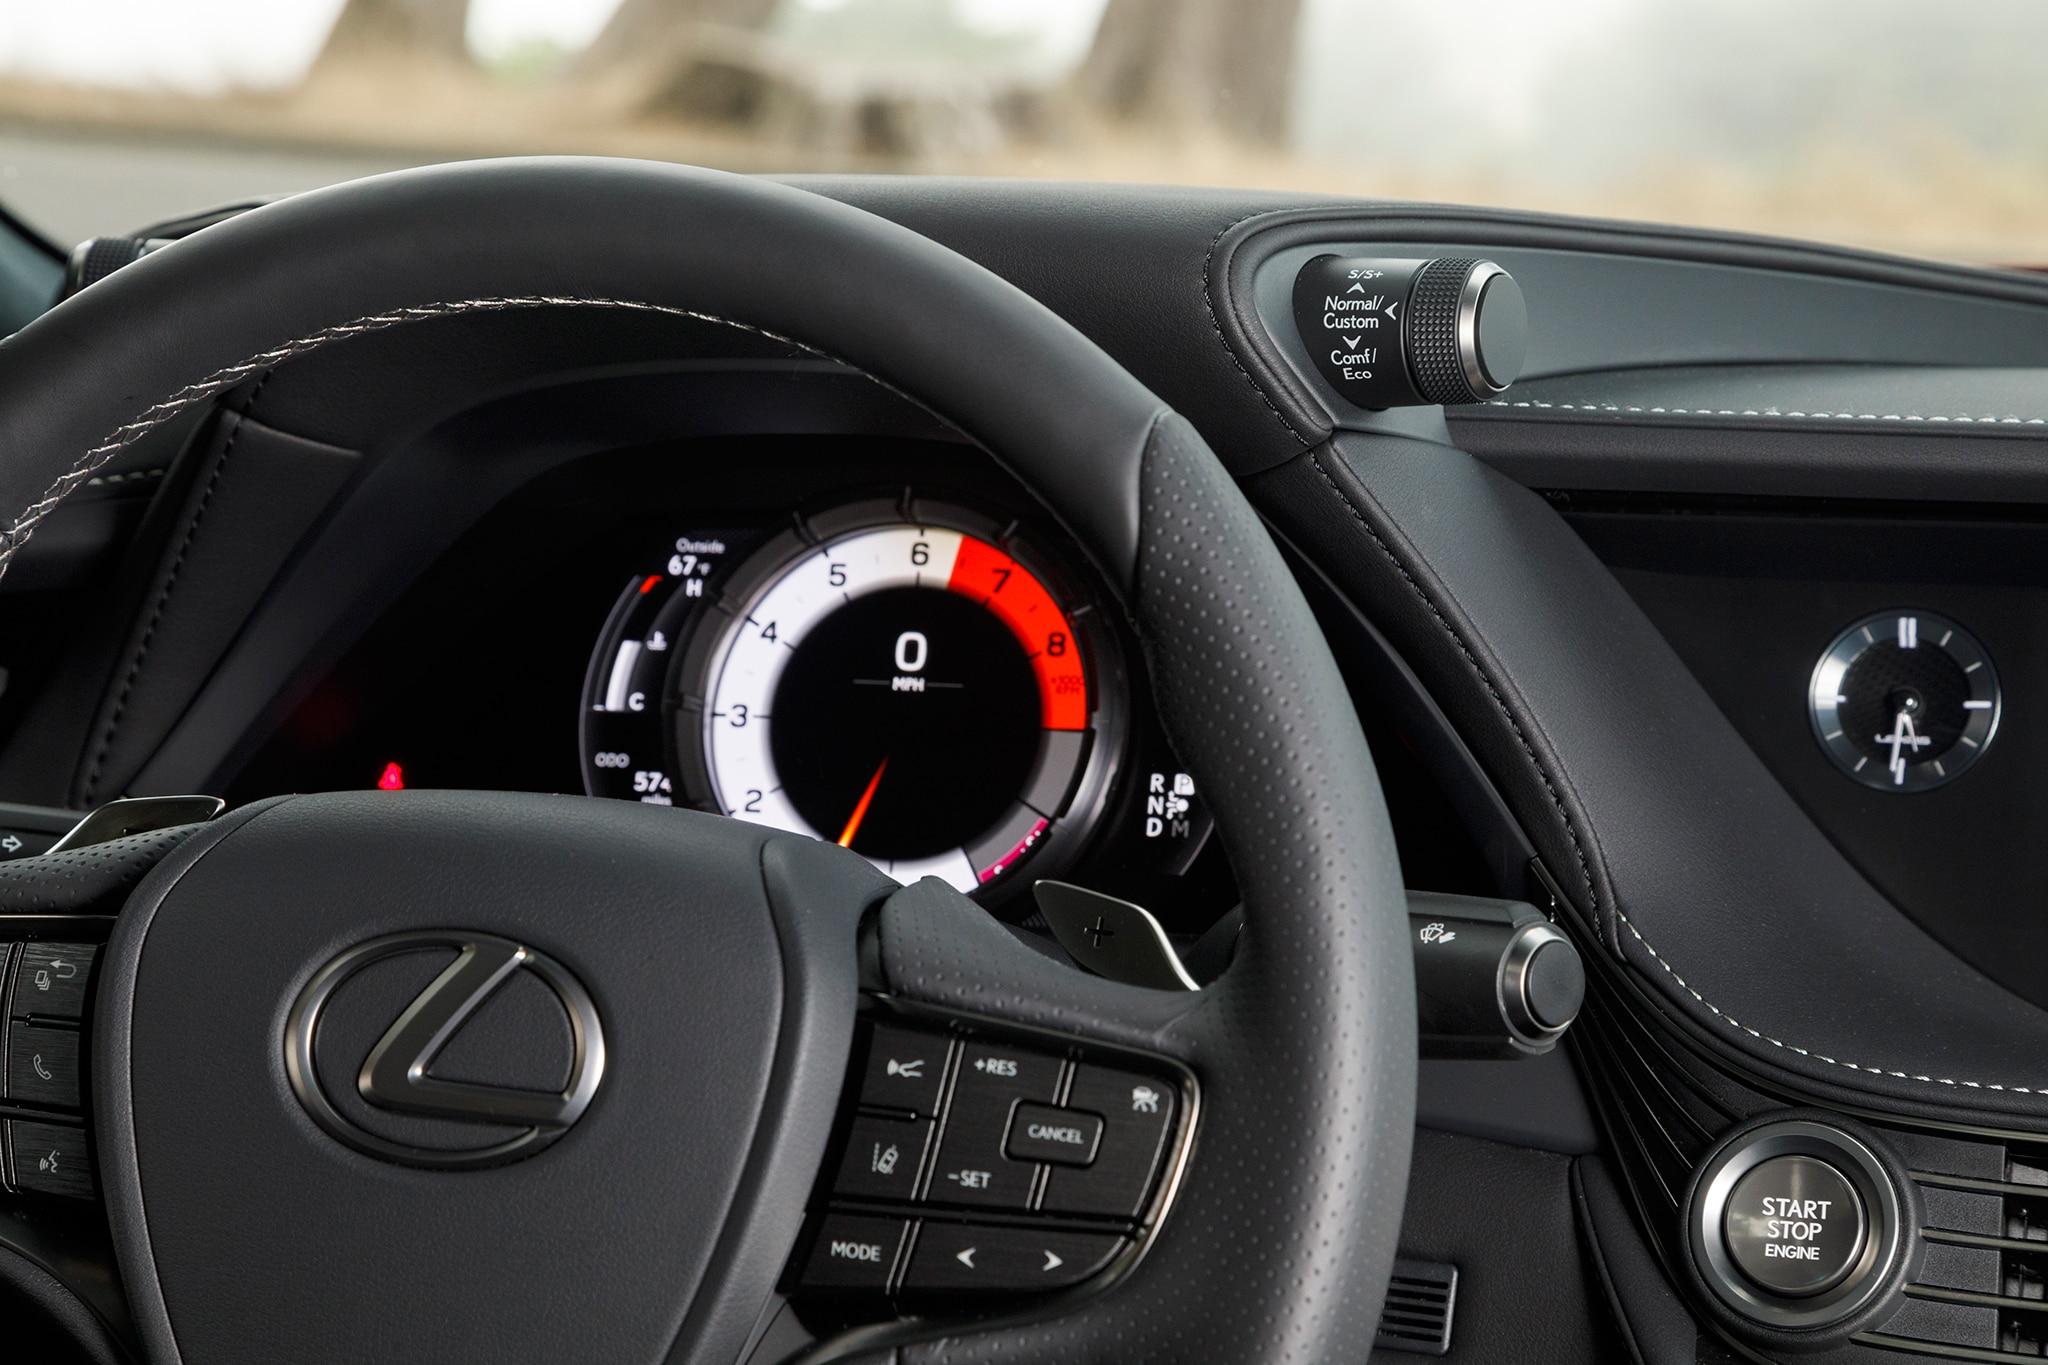 http://st.automobilemag.com/uploads/sites/11/2017/09/2018-Lexus-LS-500-F-Sport-instrument-display.jpg